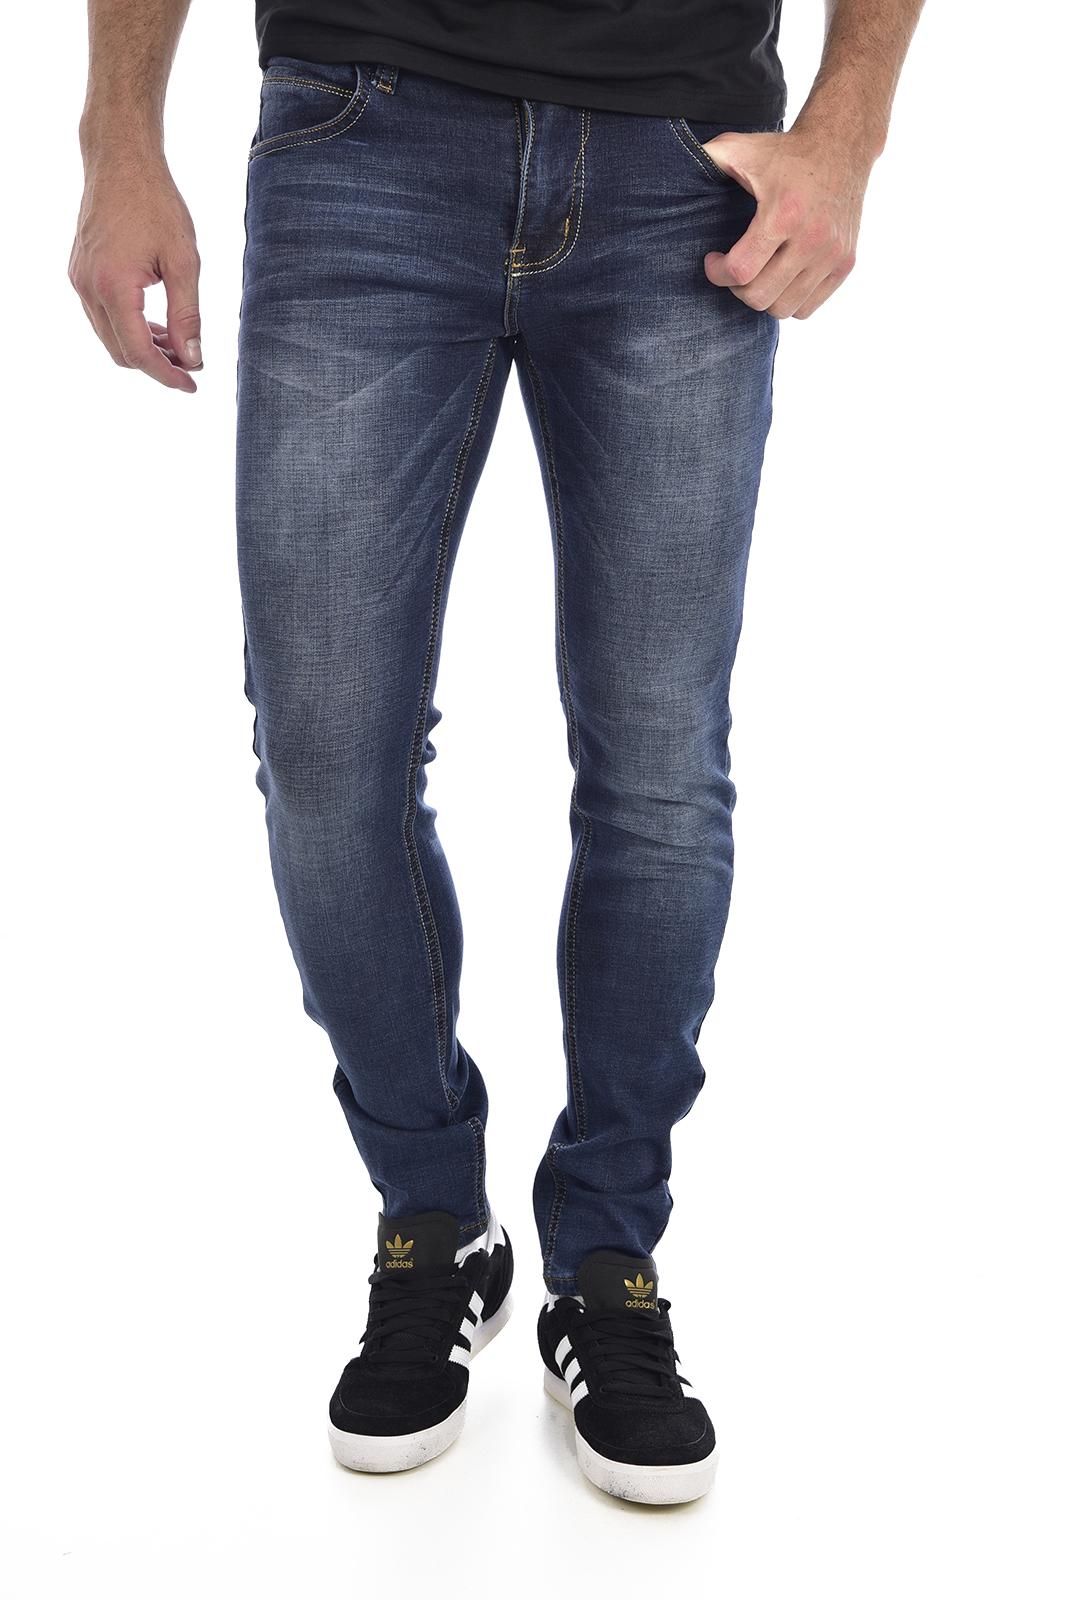 Jeans  Leo gutti 5141 bleu